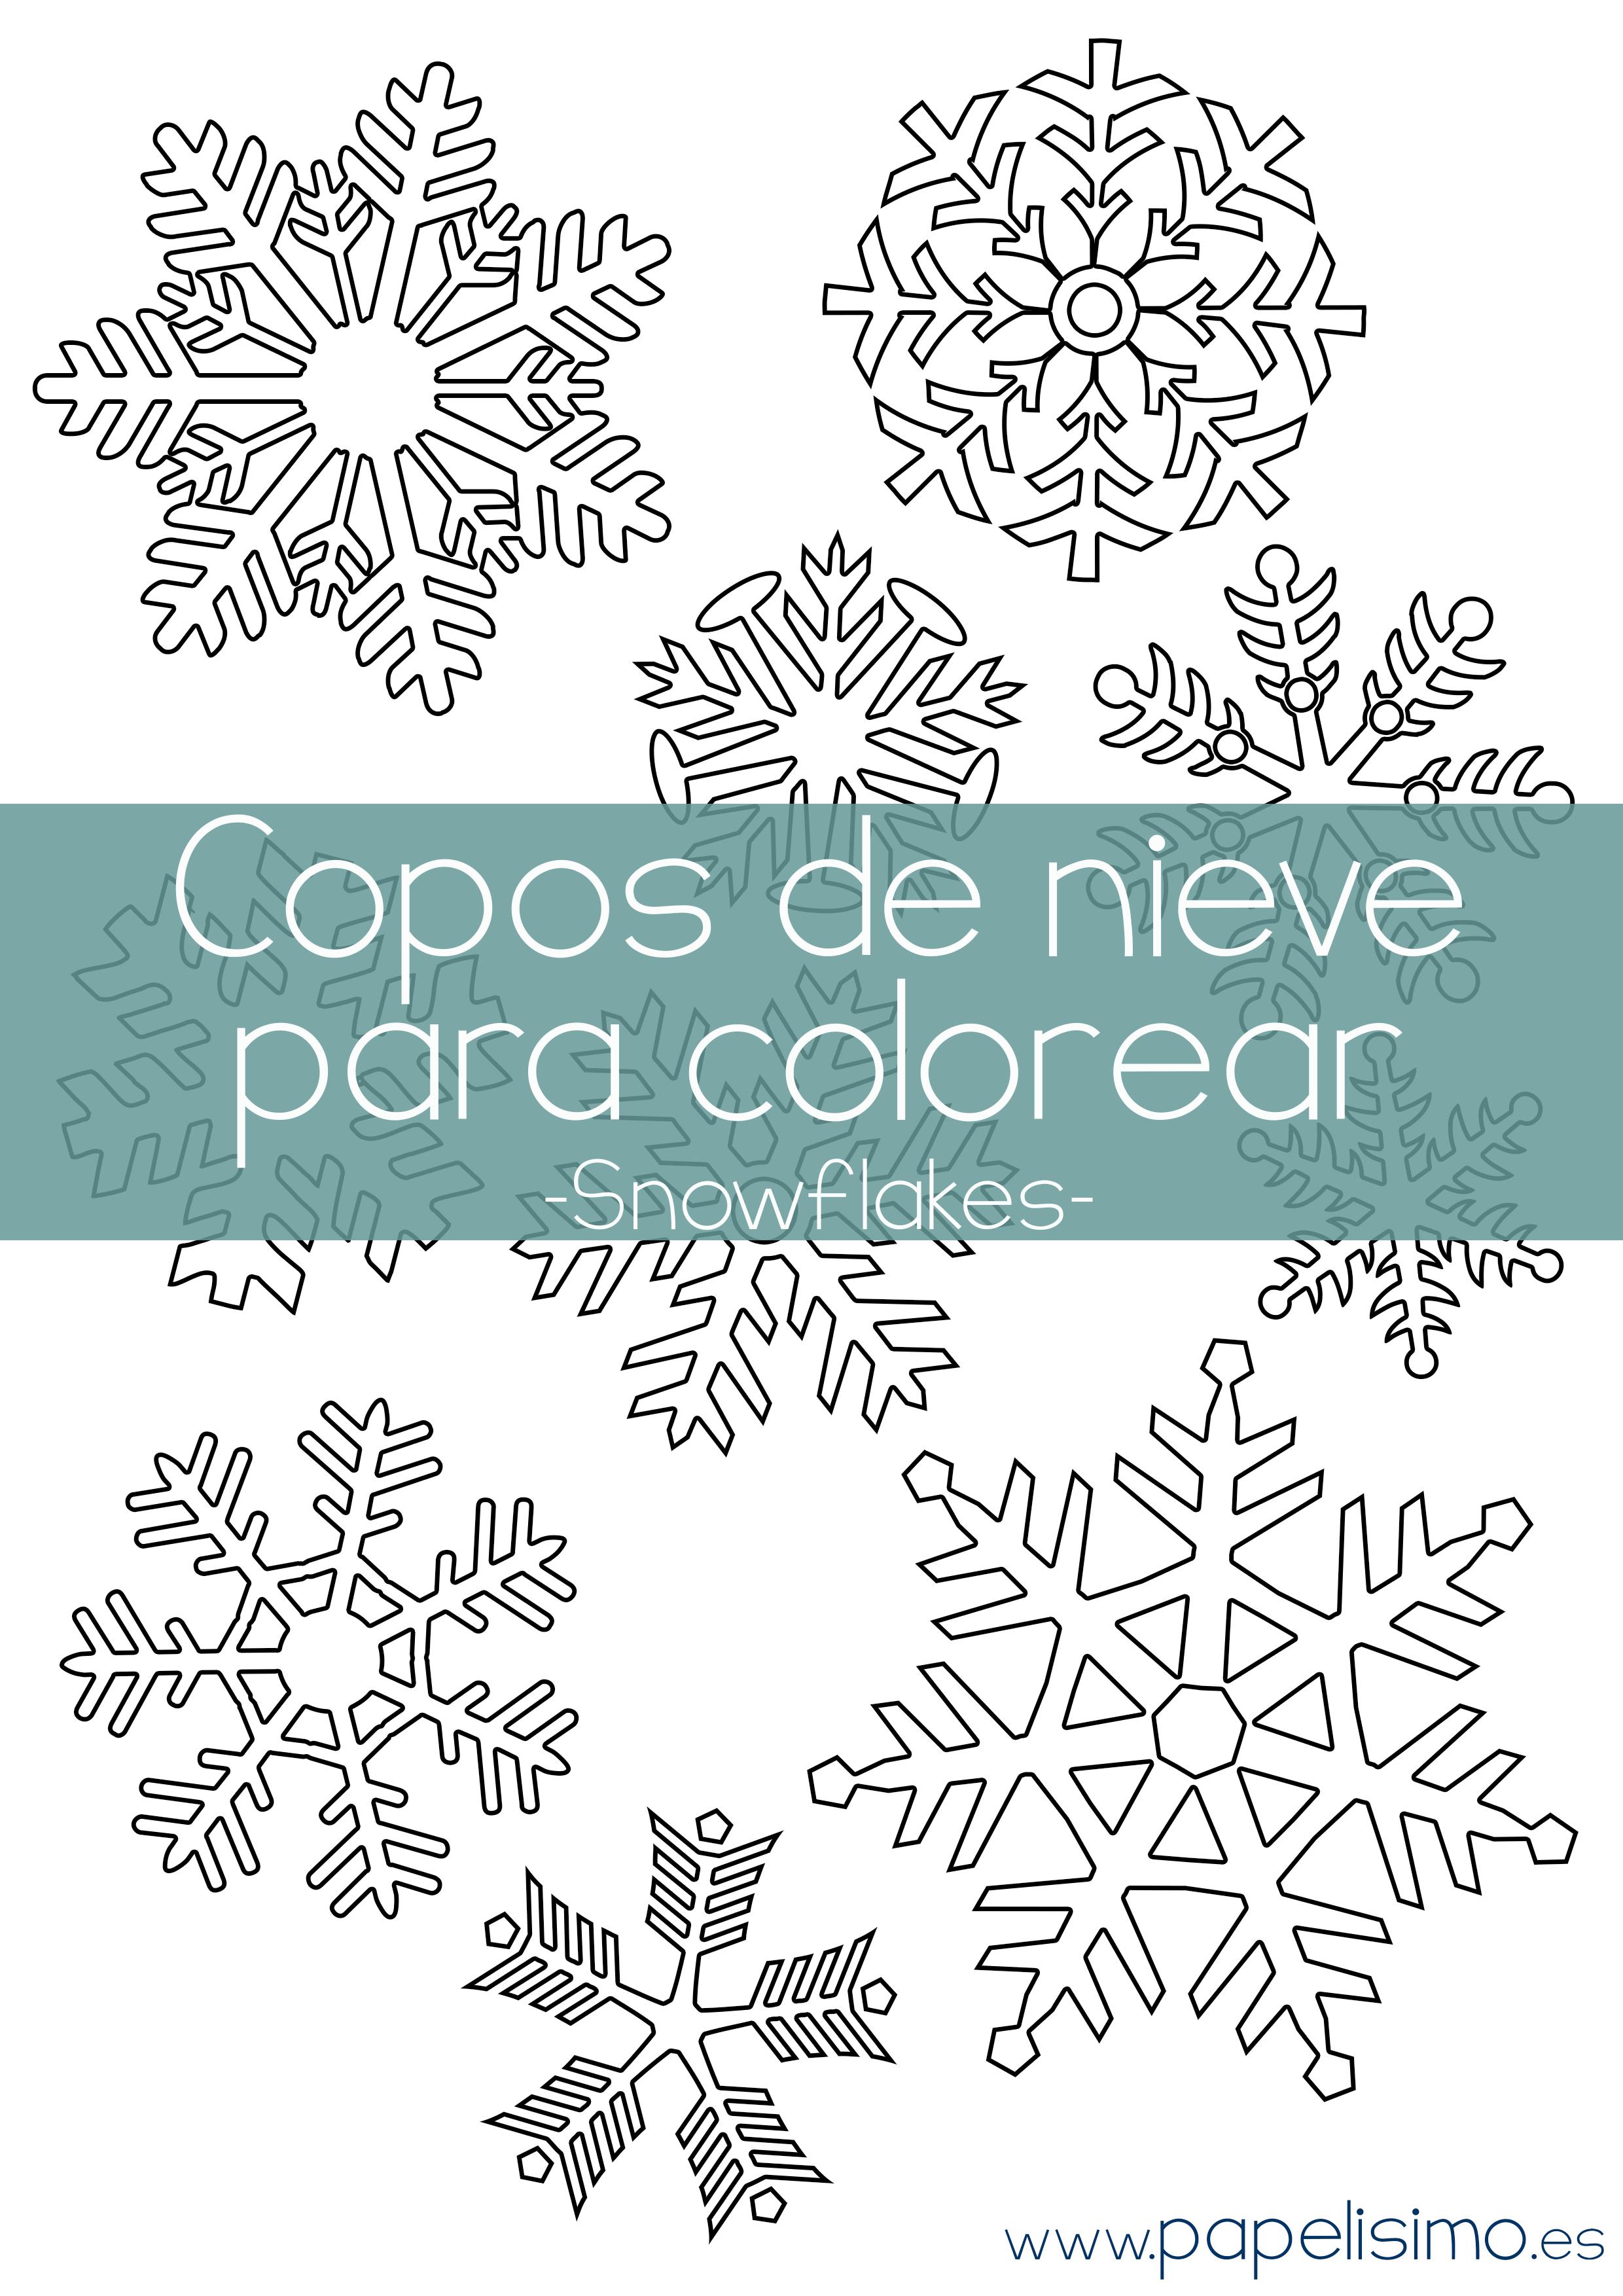 Copos de nieve para colorear | Papelisimo | Pinterest | Nieve ...